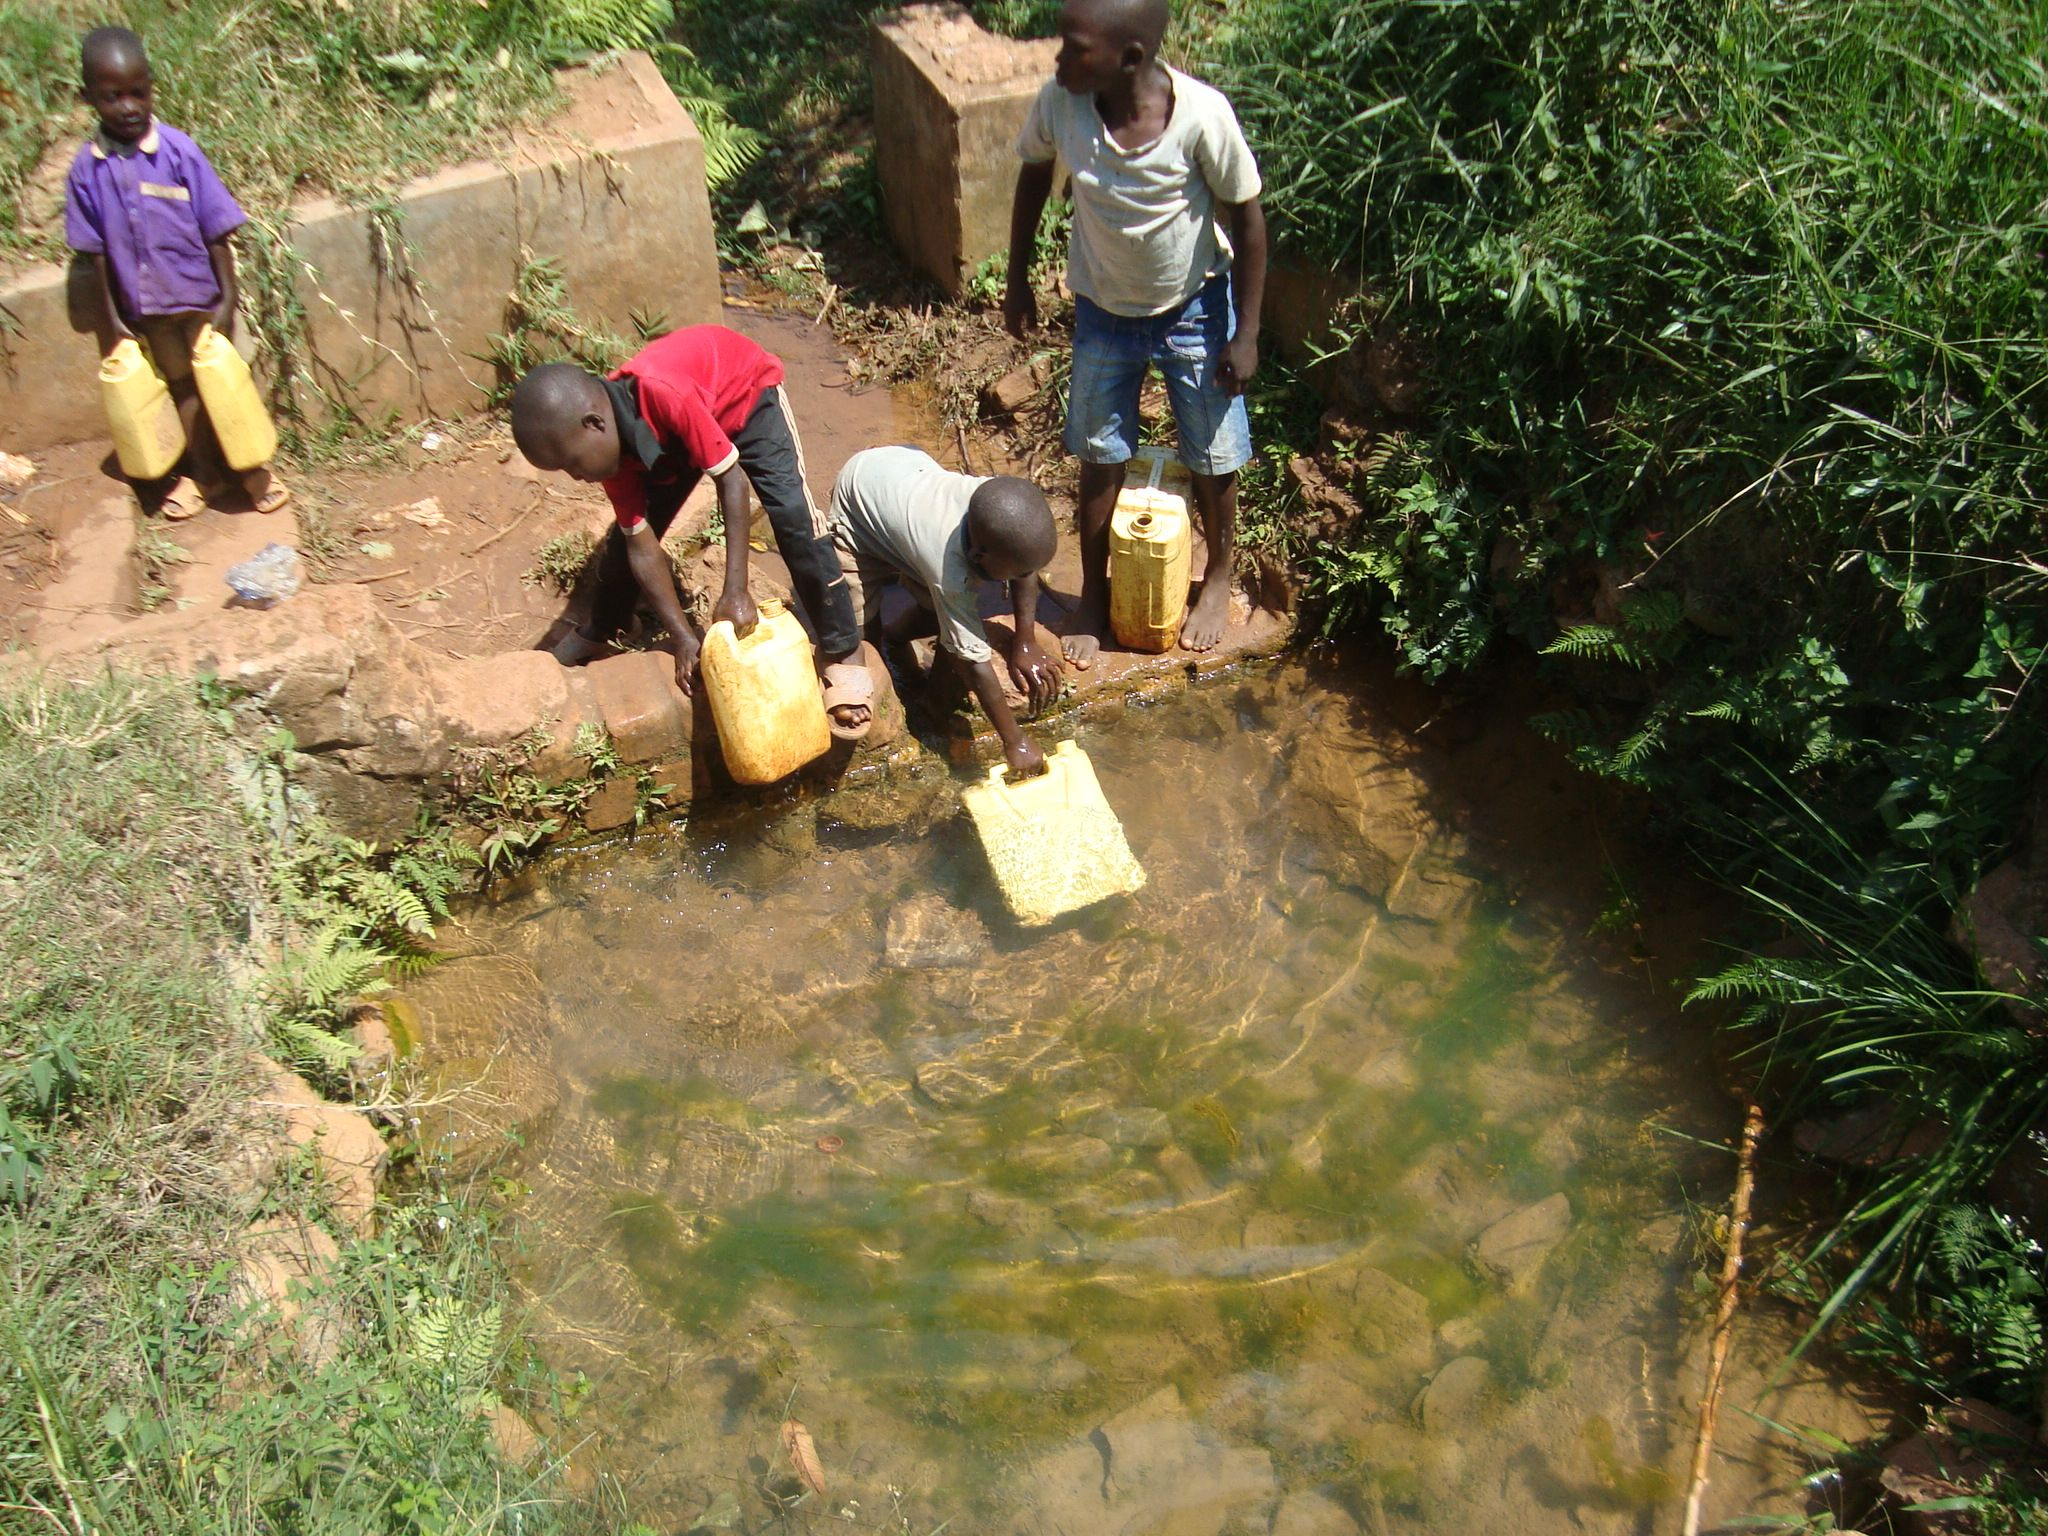 Collecting water, Uganda.